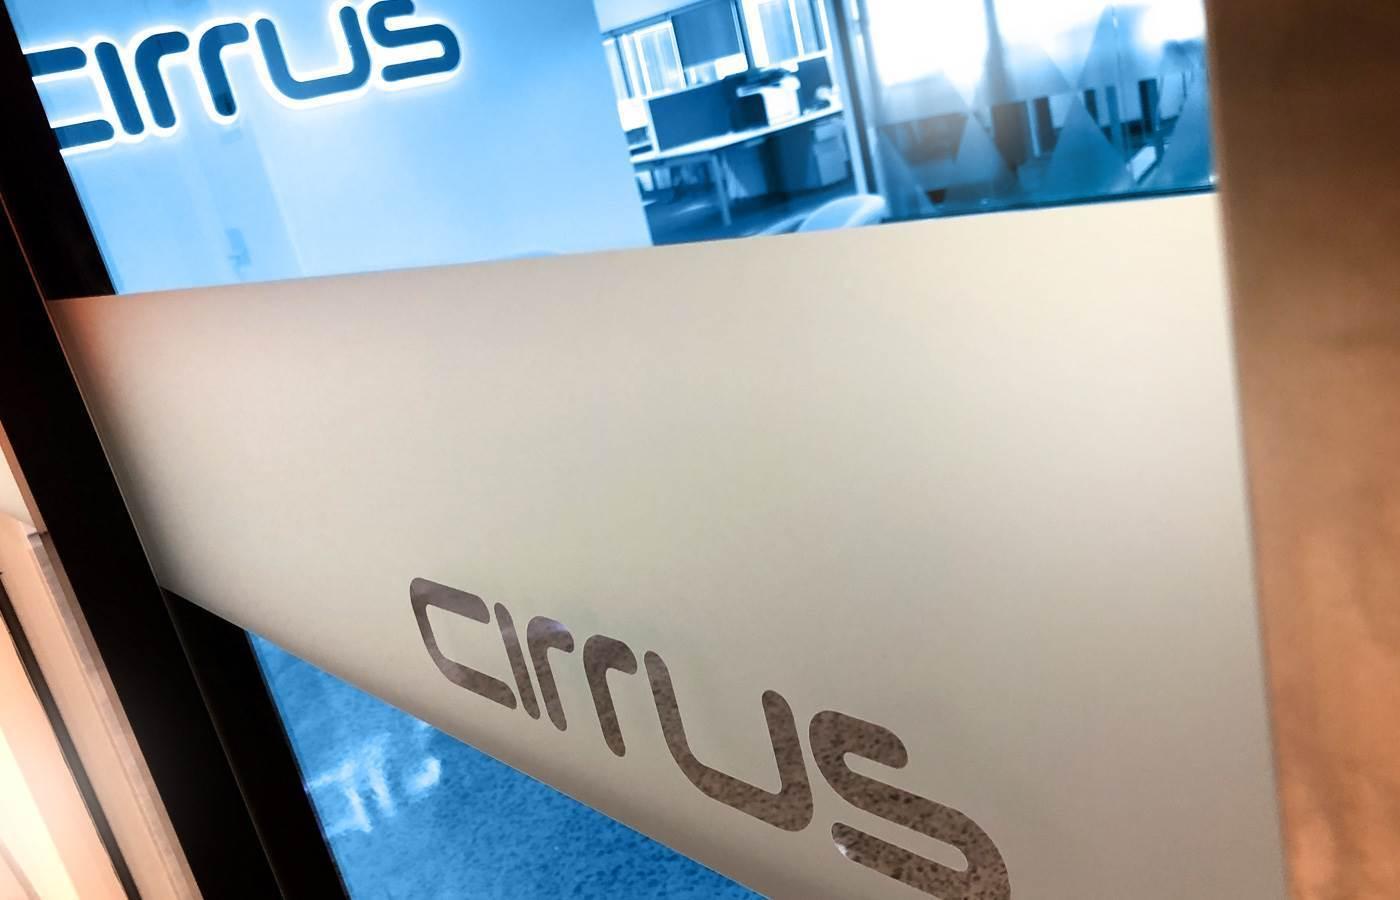 Cirrus Networks wins Cisco, Pure Storage deals with WA